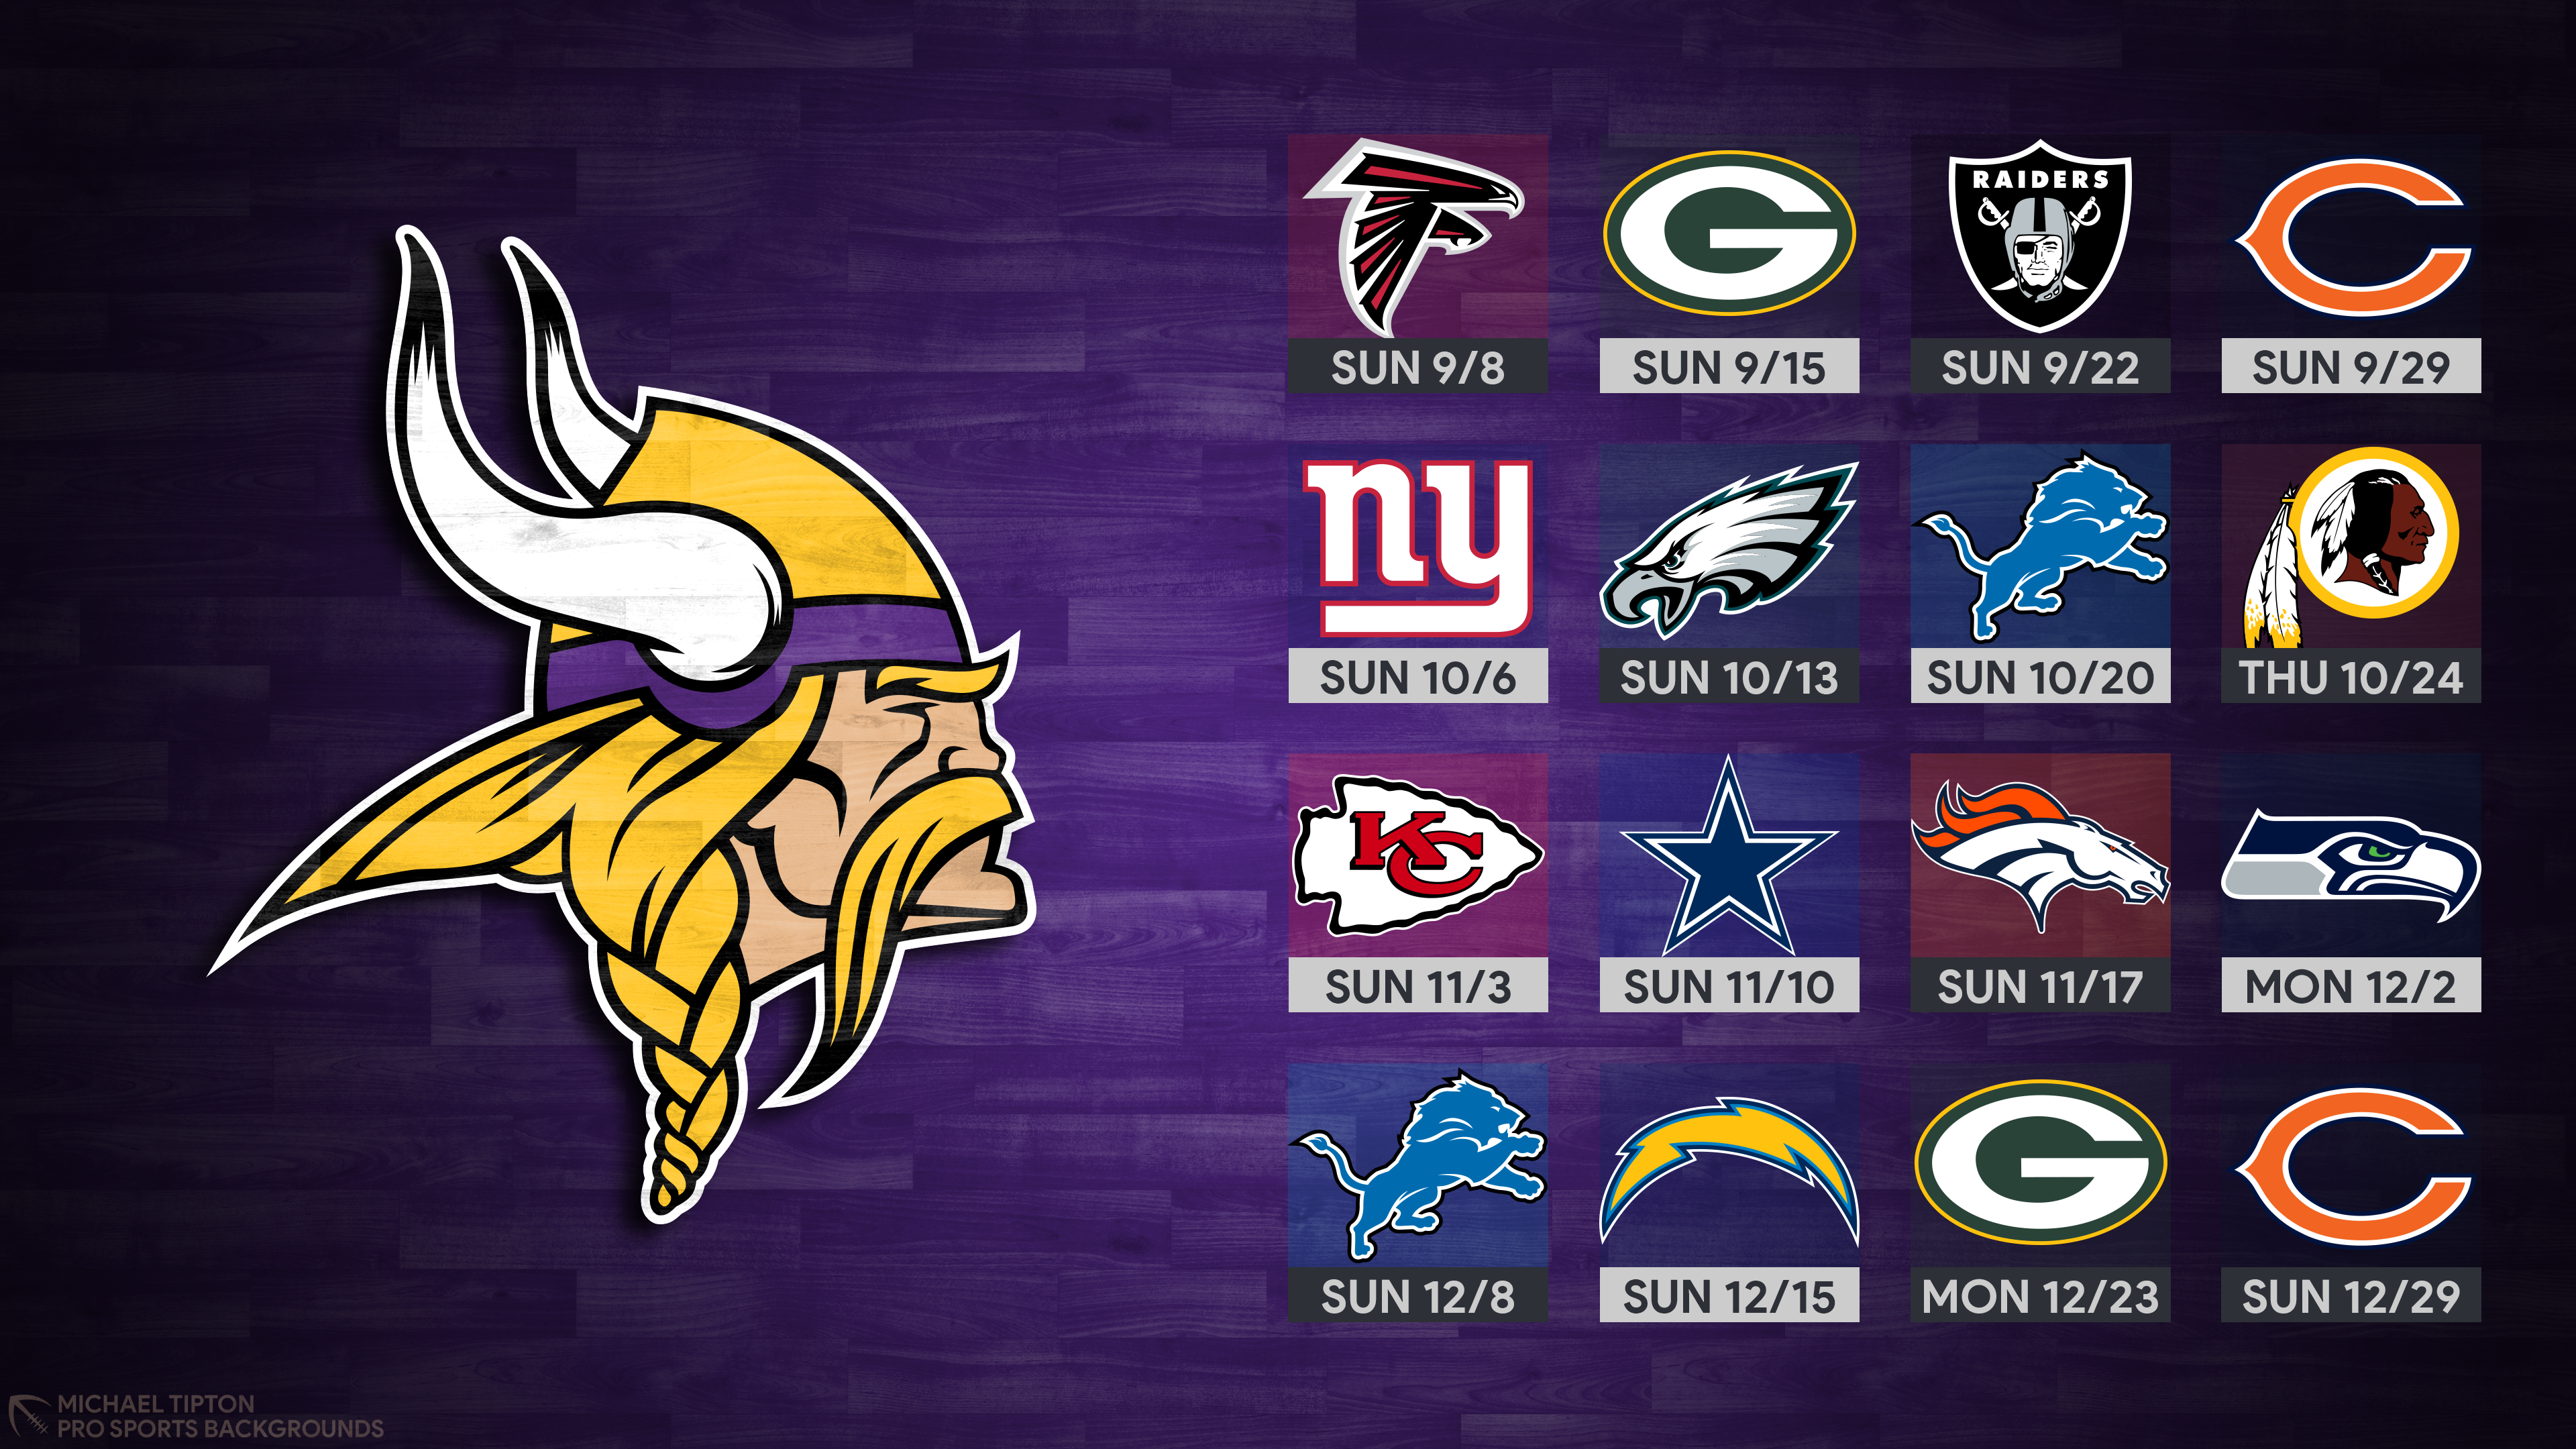 2019 Minnesota Vikings Wallpapers Pro Sports Backgrounds 3840x2160